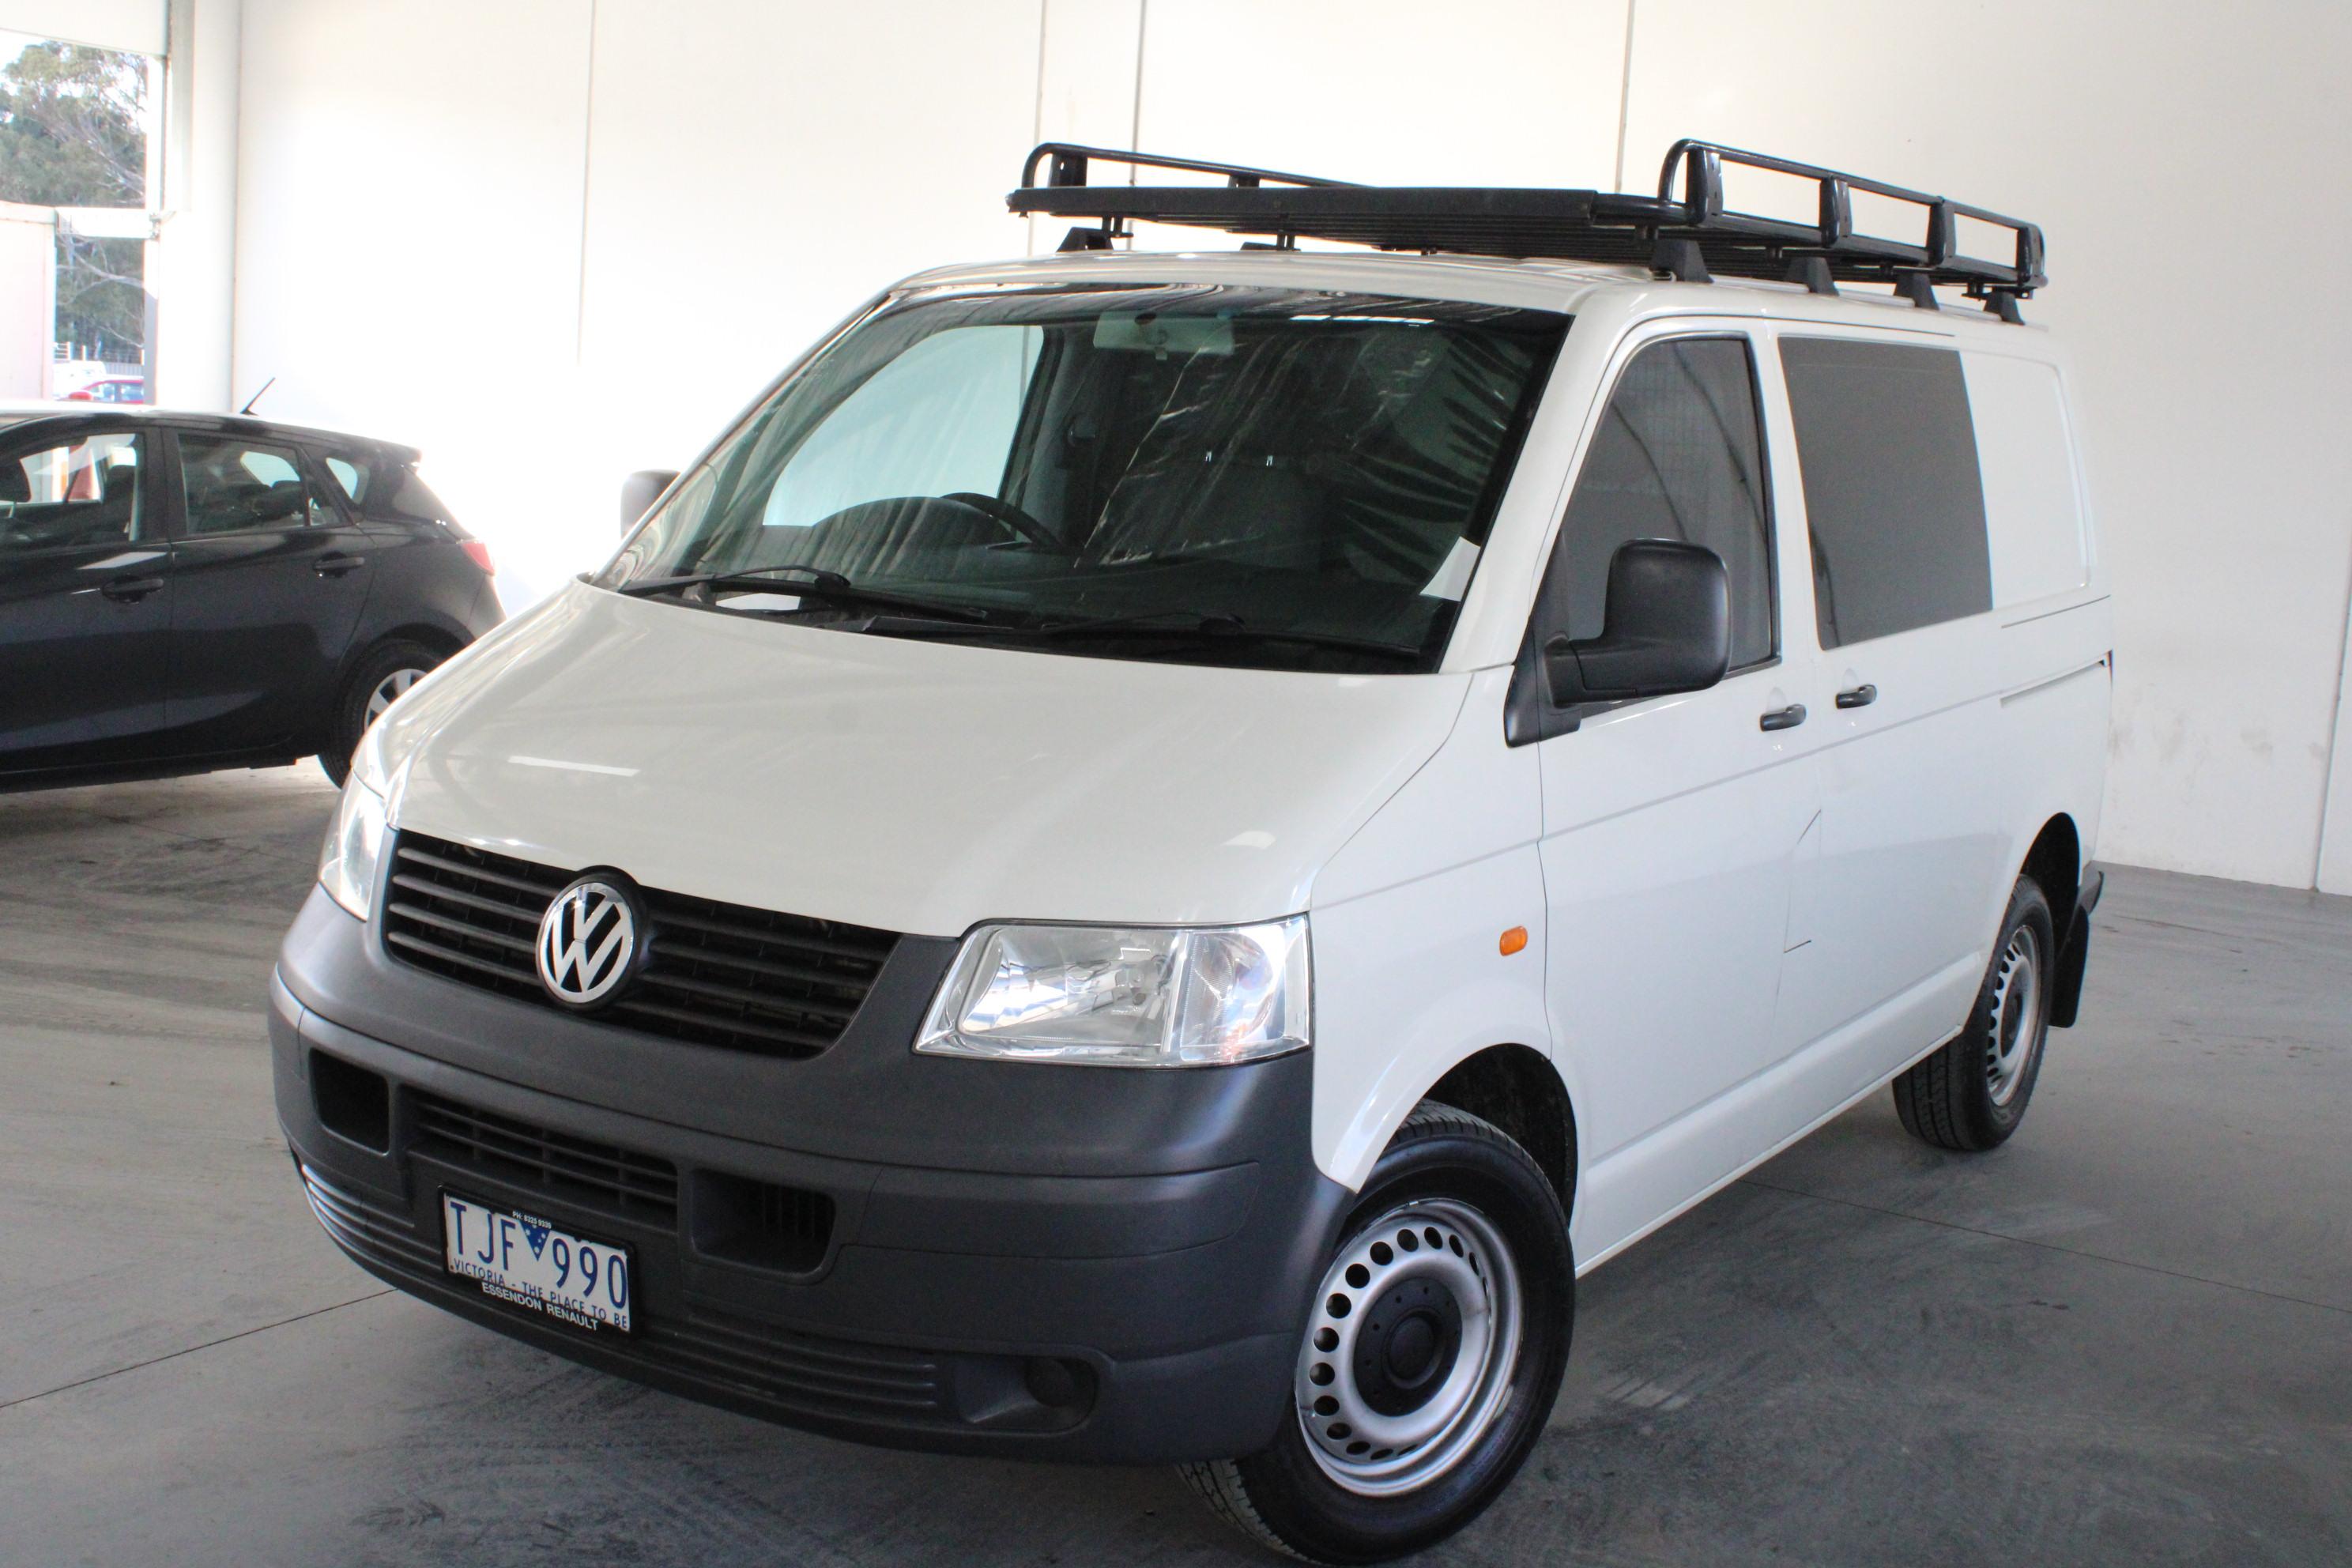 2005 Volkswagen Transporter (SWB) T5 Turbo Diesel Automatic Van